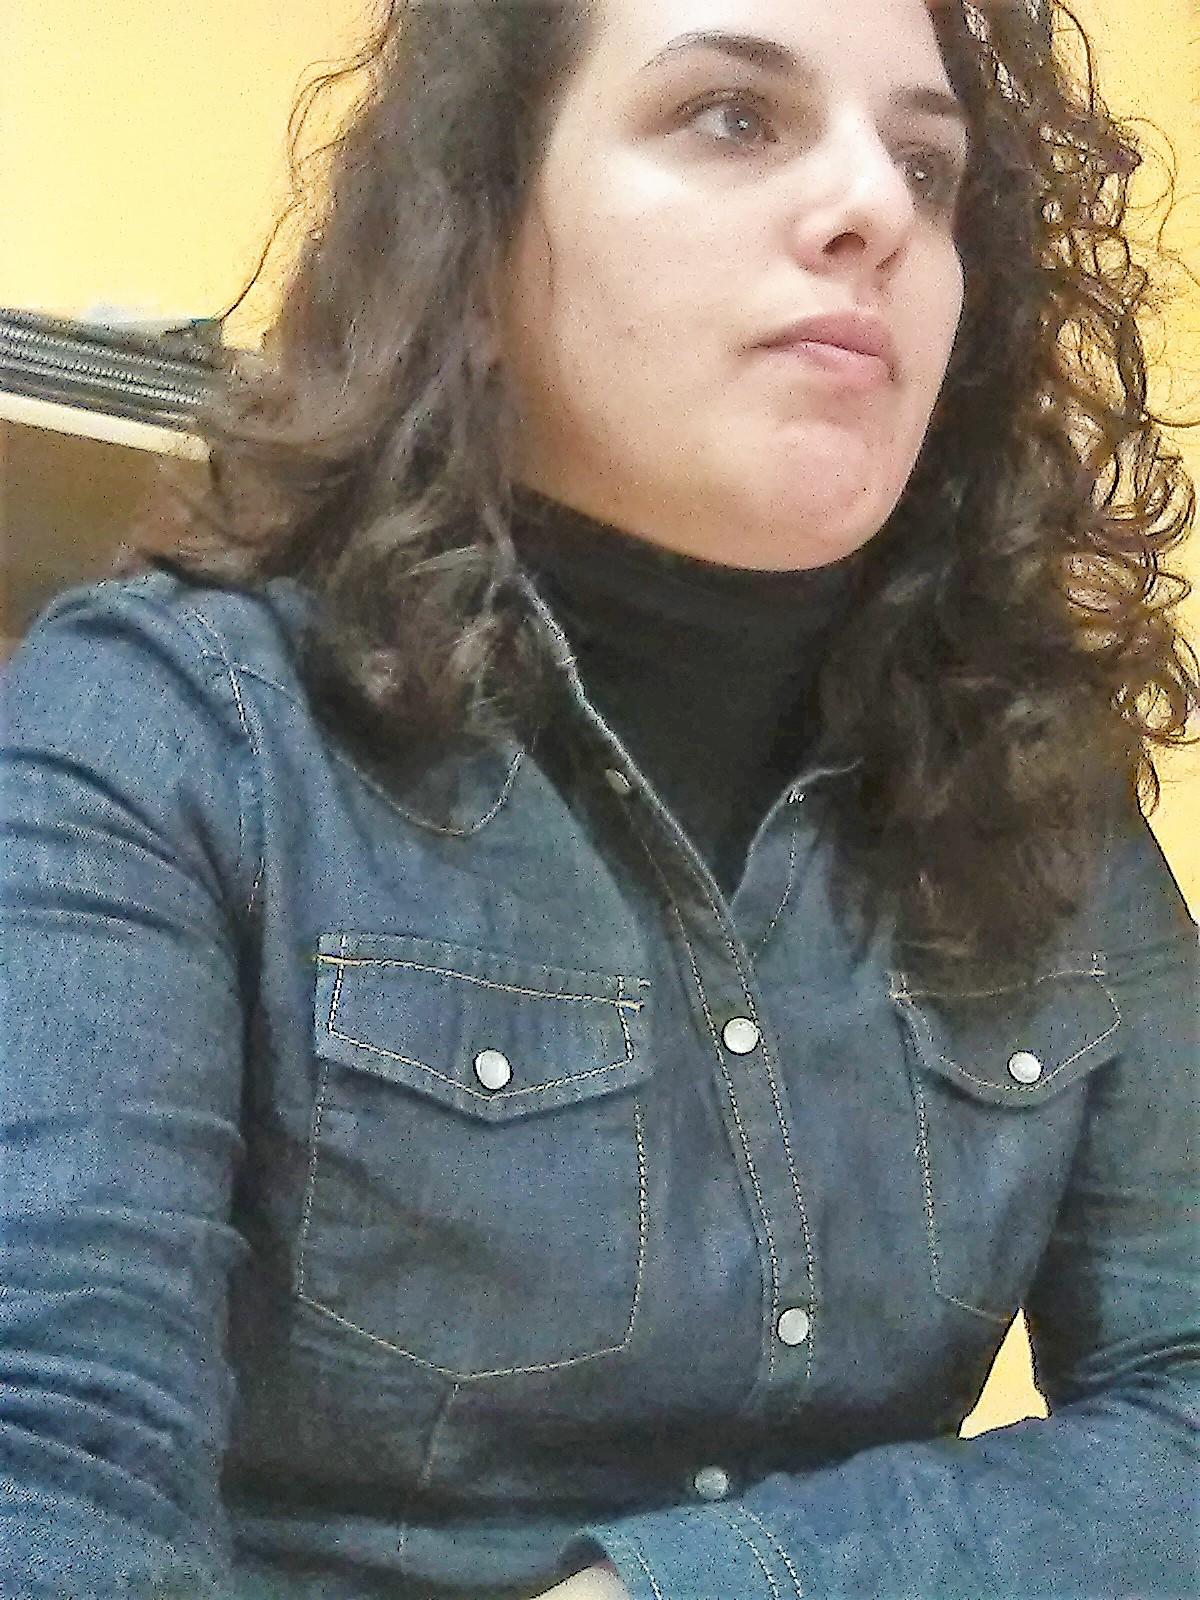 9th and 10th week of my EYE in Spain – Ramona Pileggi